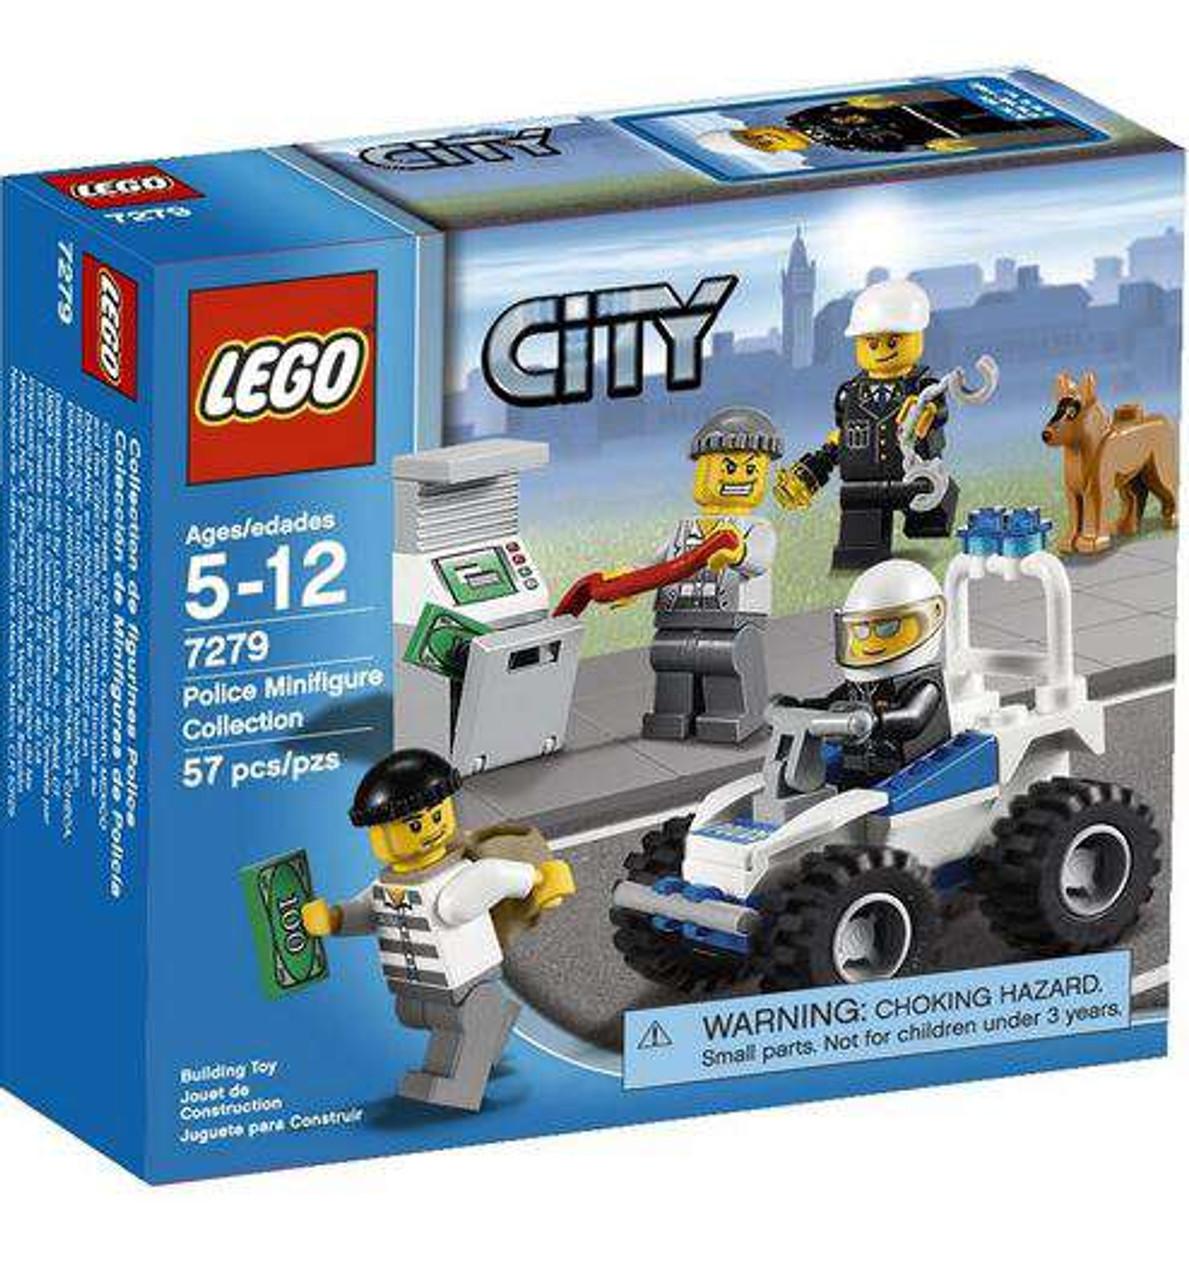 LEGO City Police Minifigure Collection Set #7279